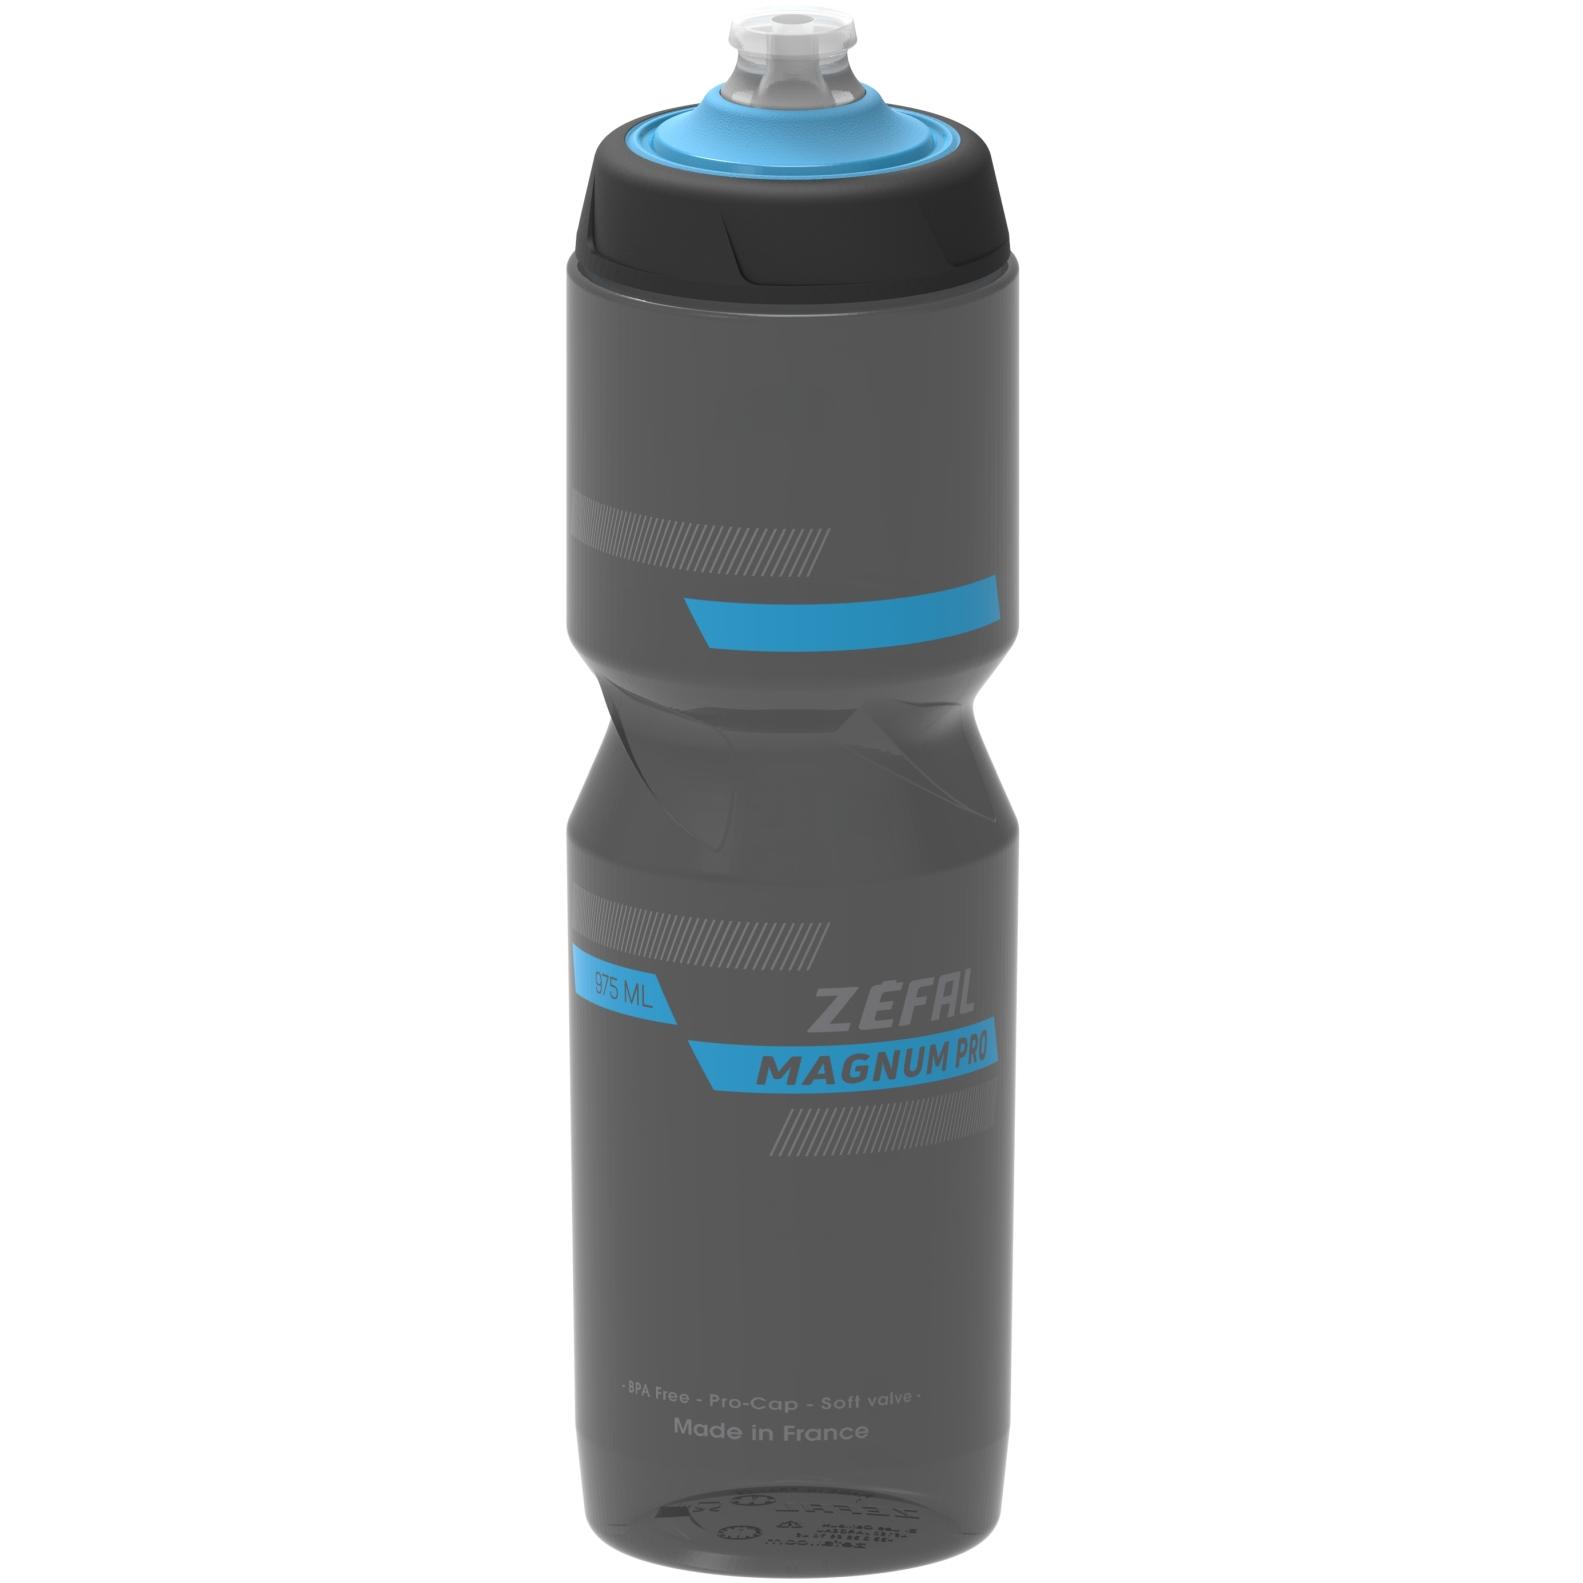 Zéfal Magnum Pro Trinkflasche 975ml - black blue/grey